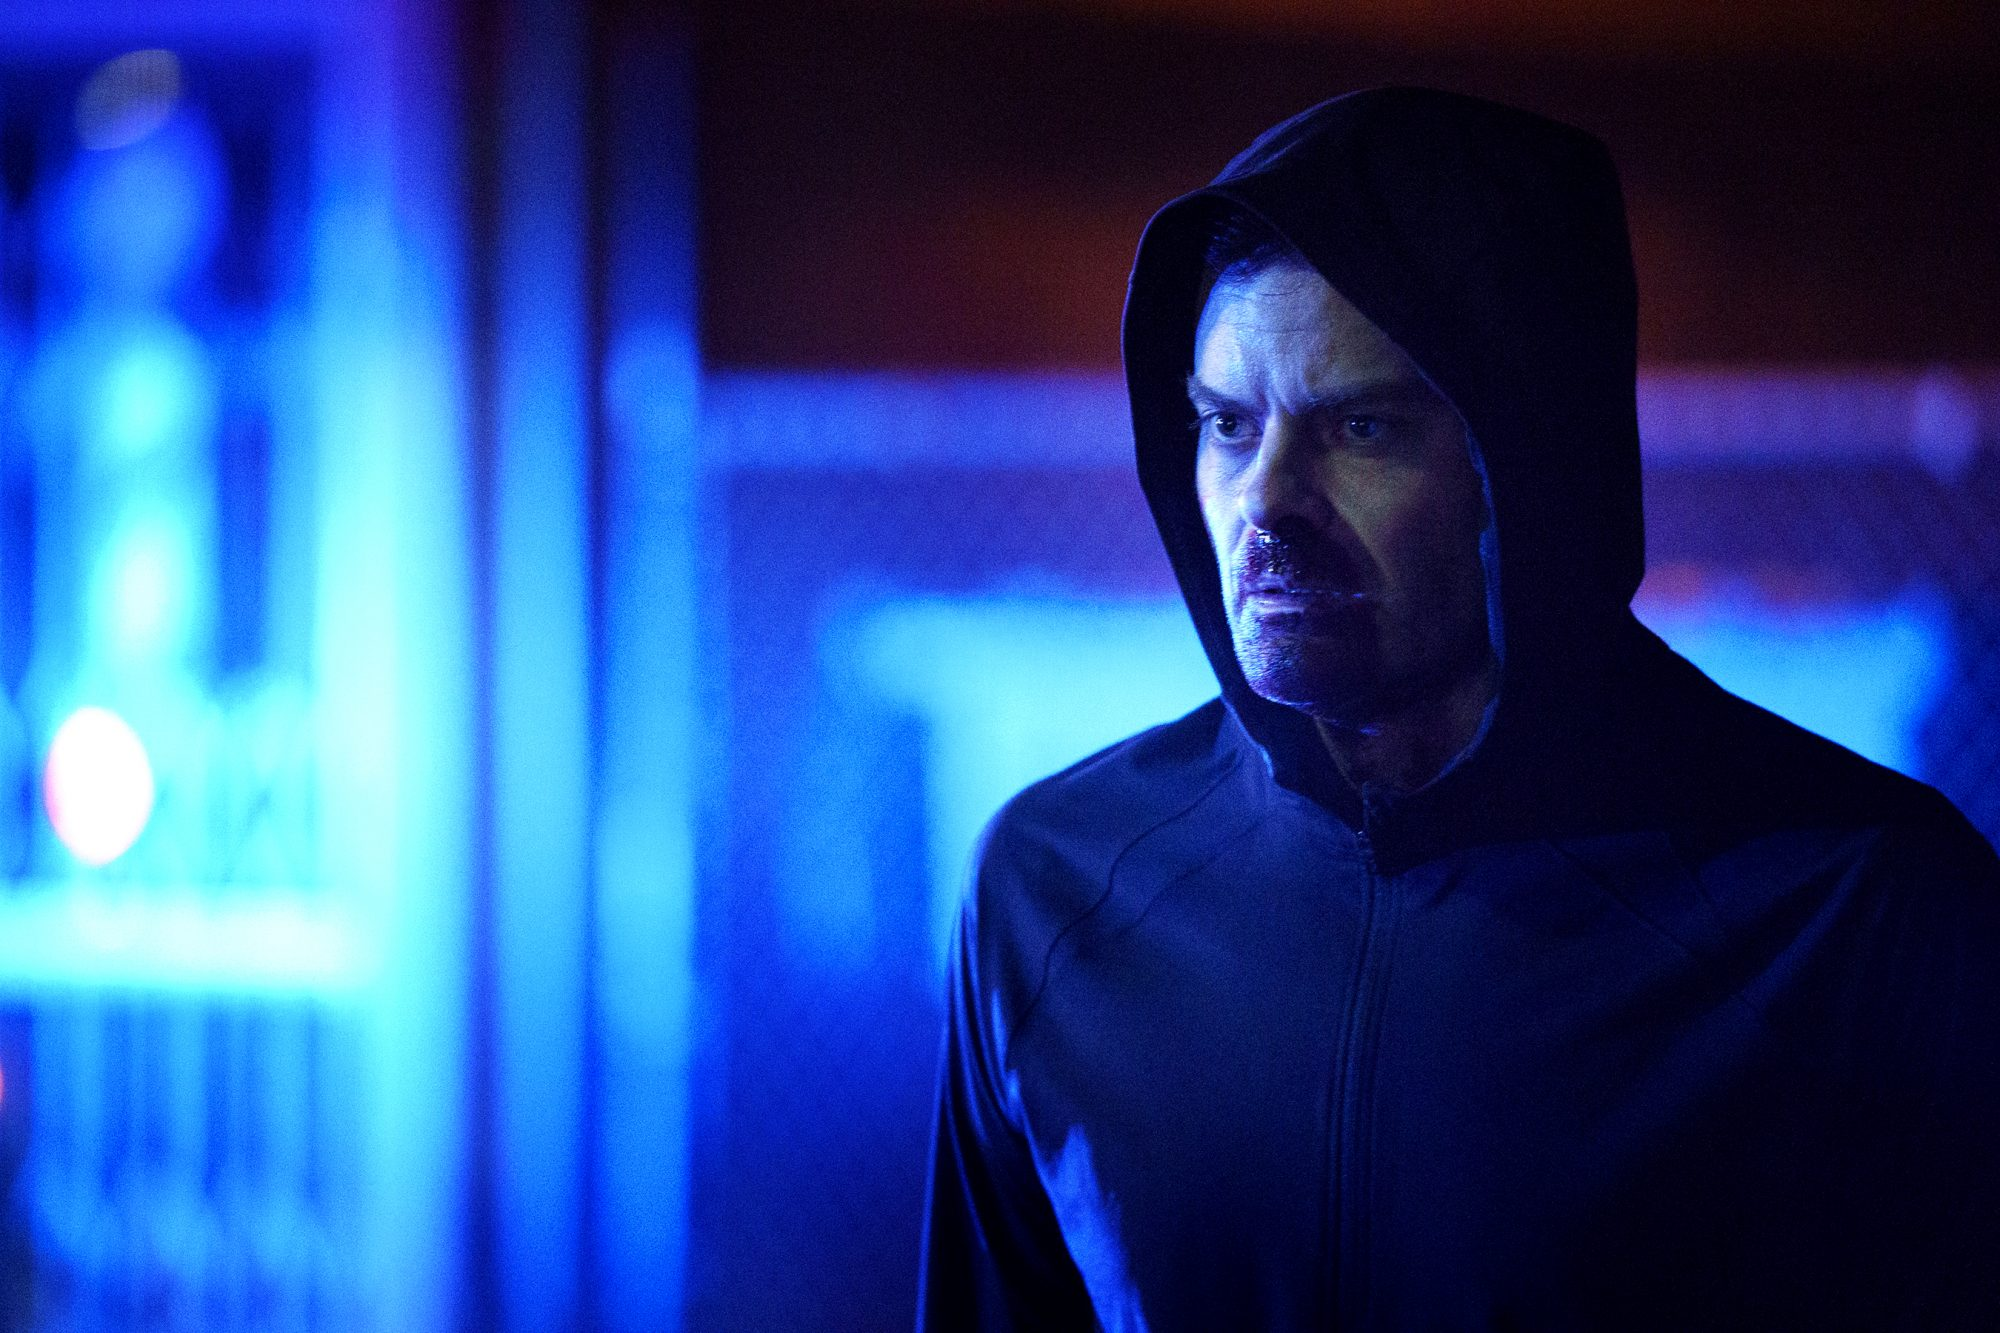 Barry Season 2, Episode 5 Bill Hader